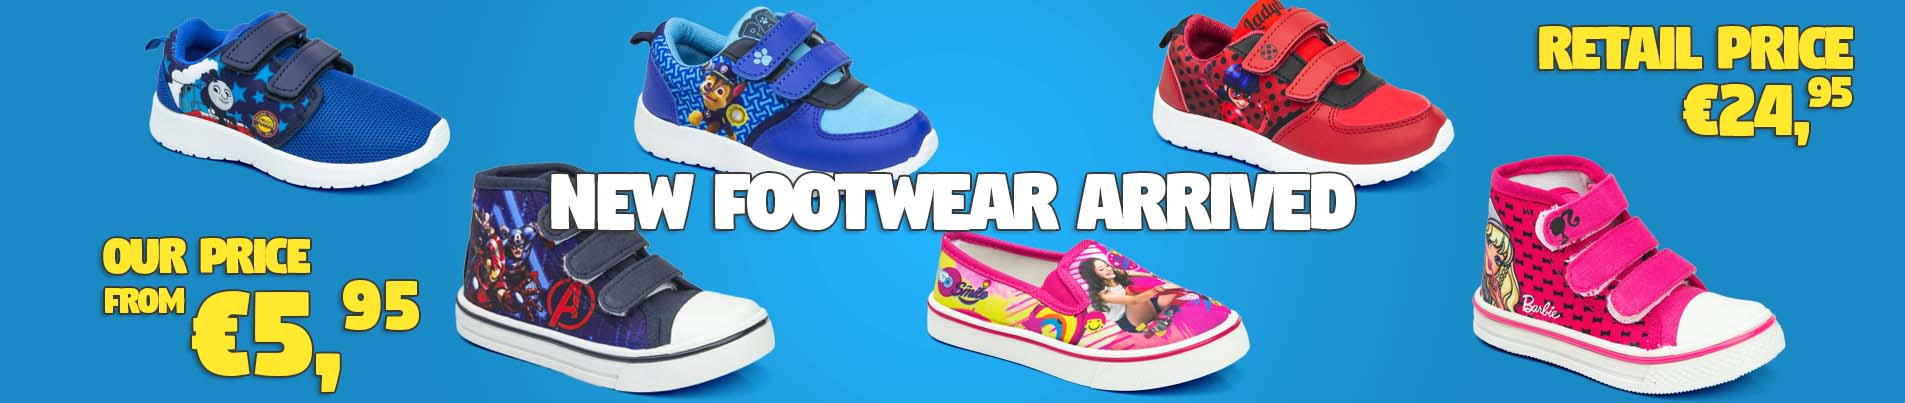 Wholesale footwear for children Disney licenses.